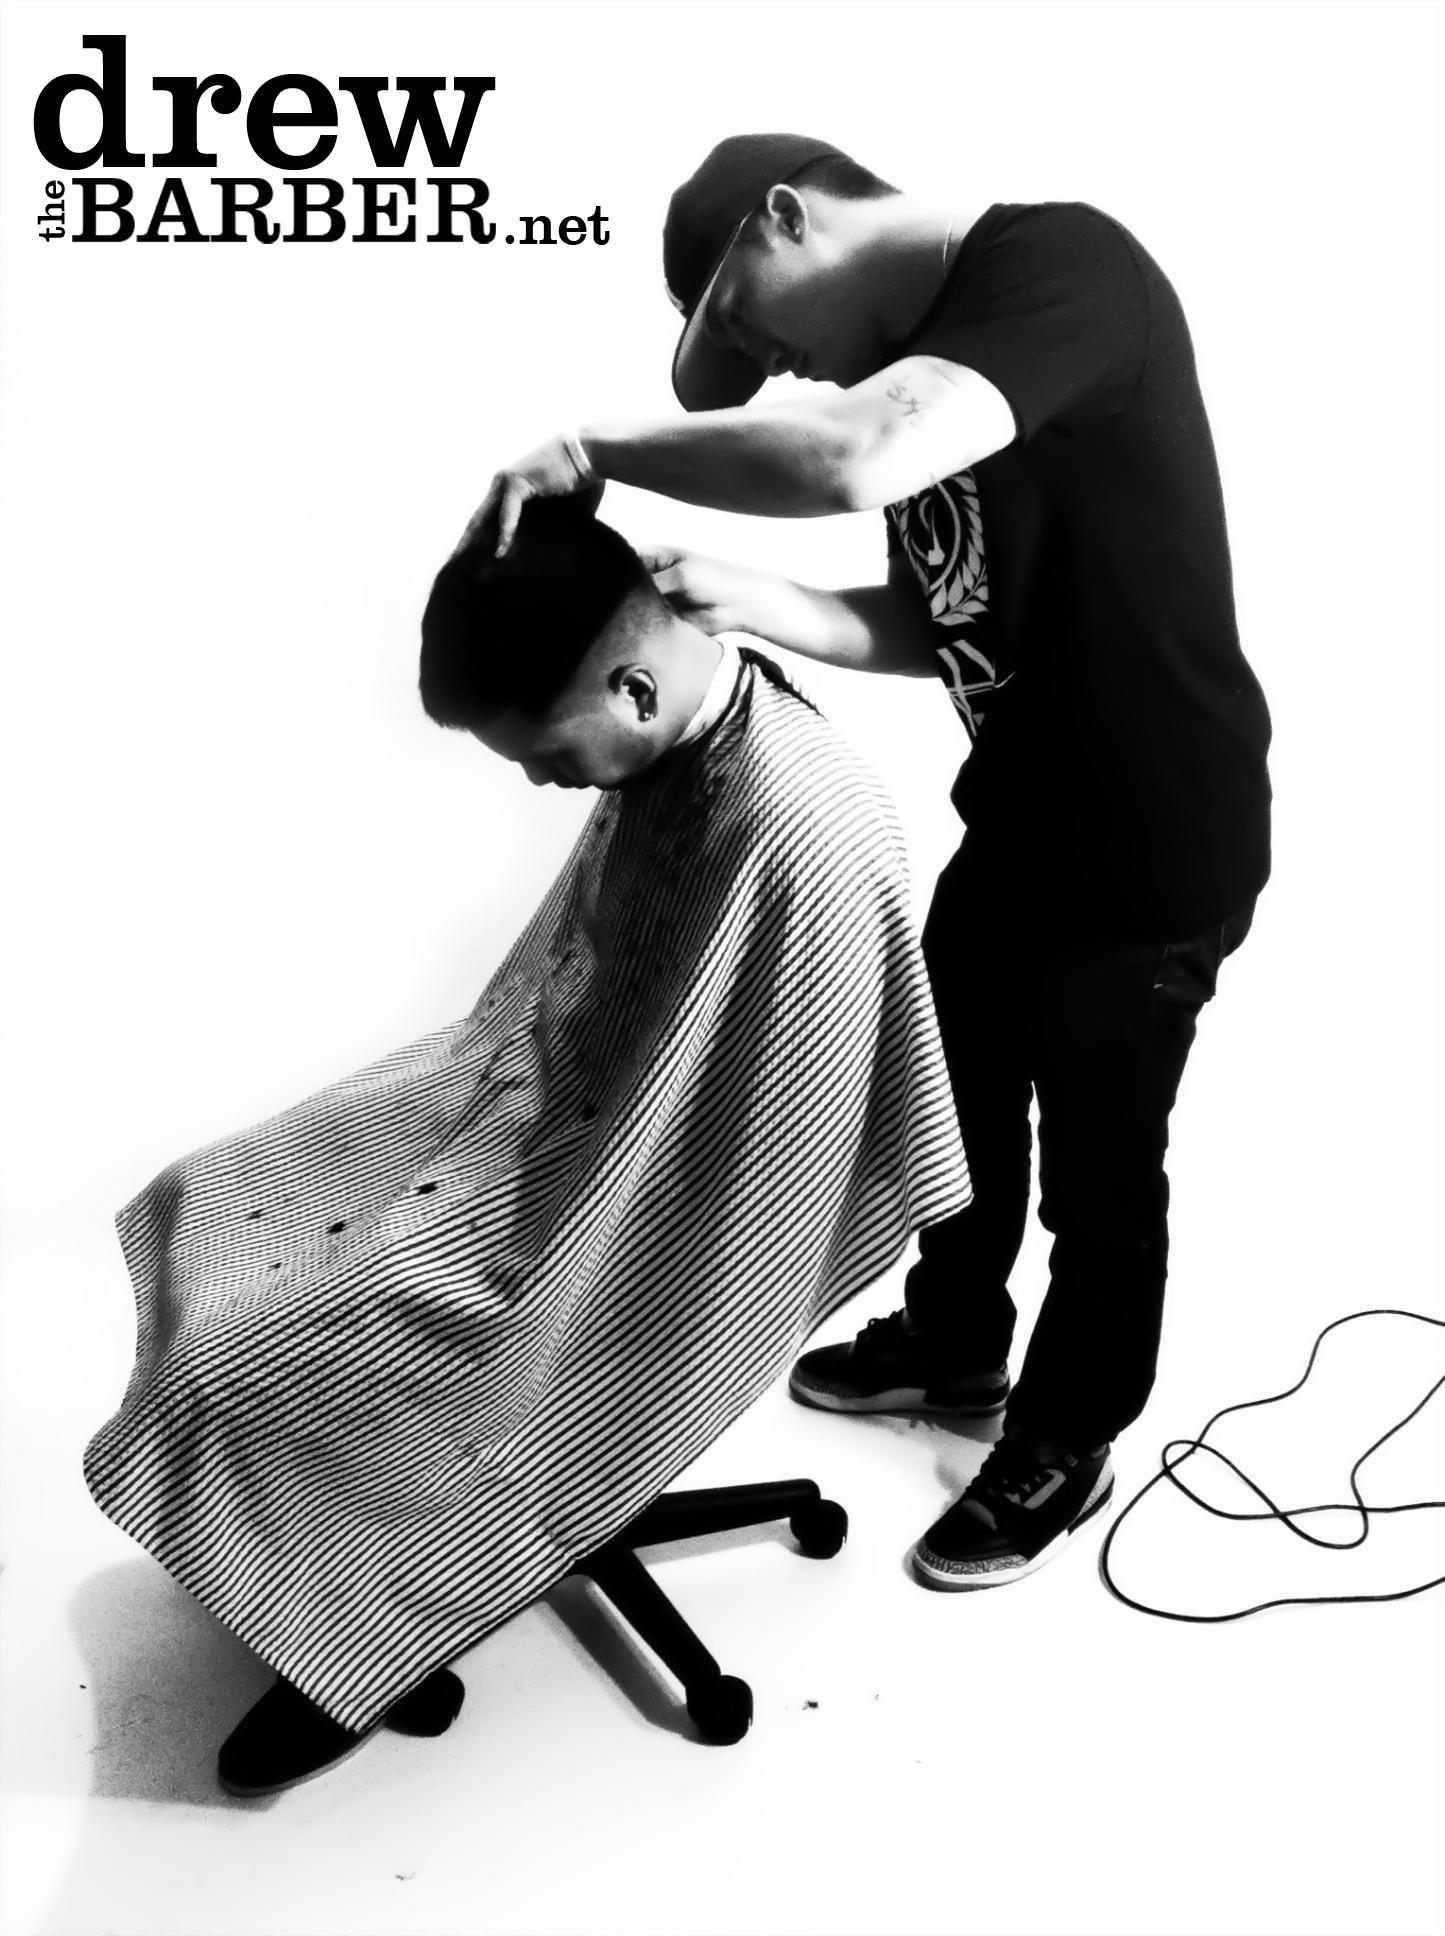 Represent: Drew The Barber